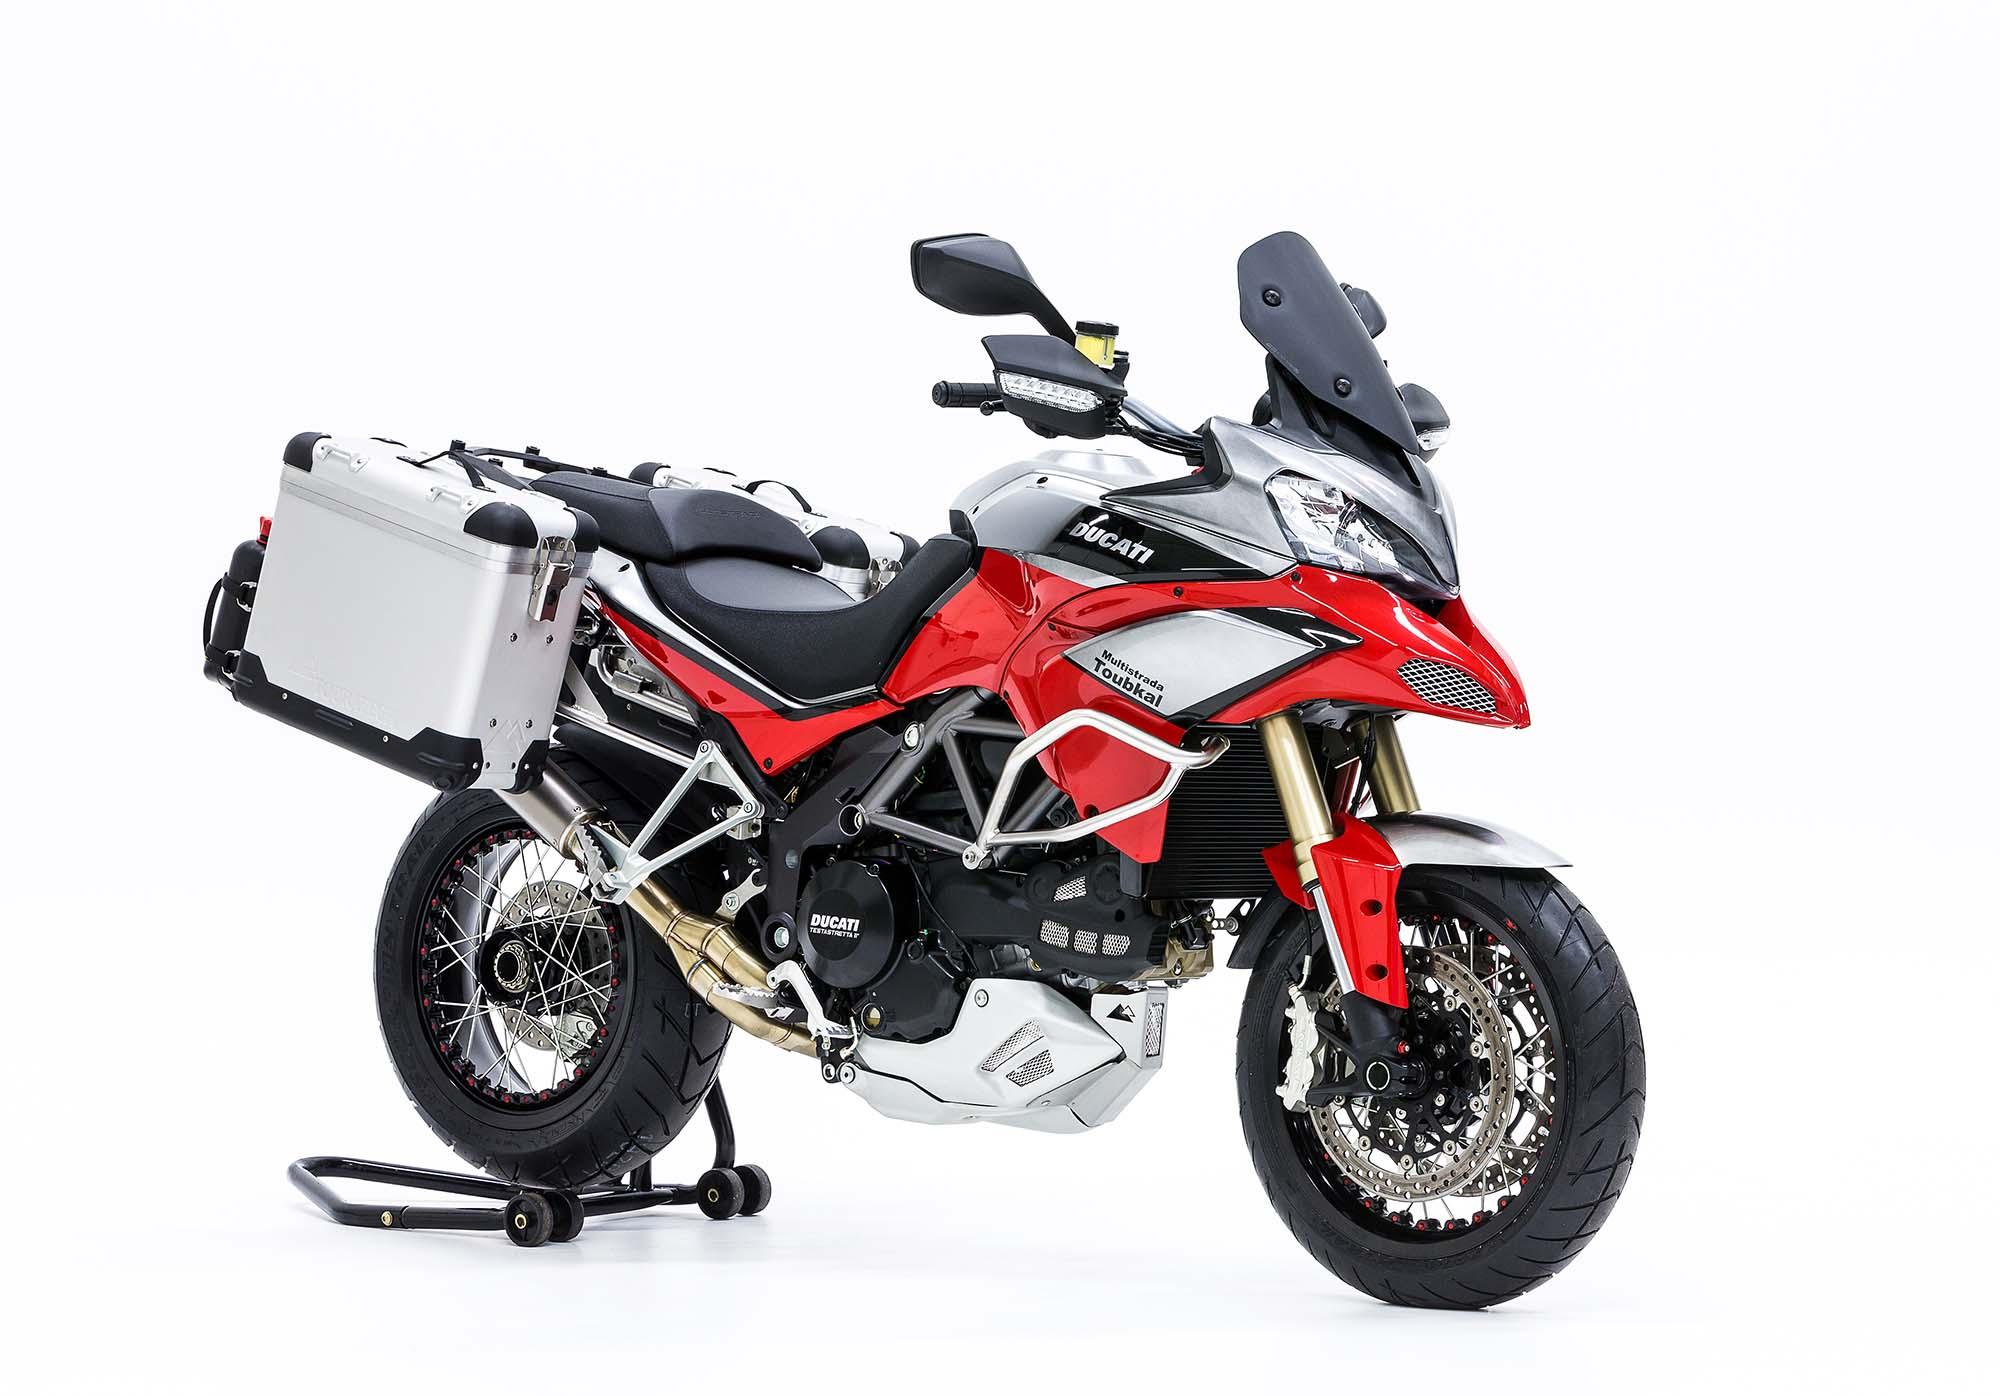 Ducati Hypermotard Adventure Bike